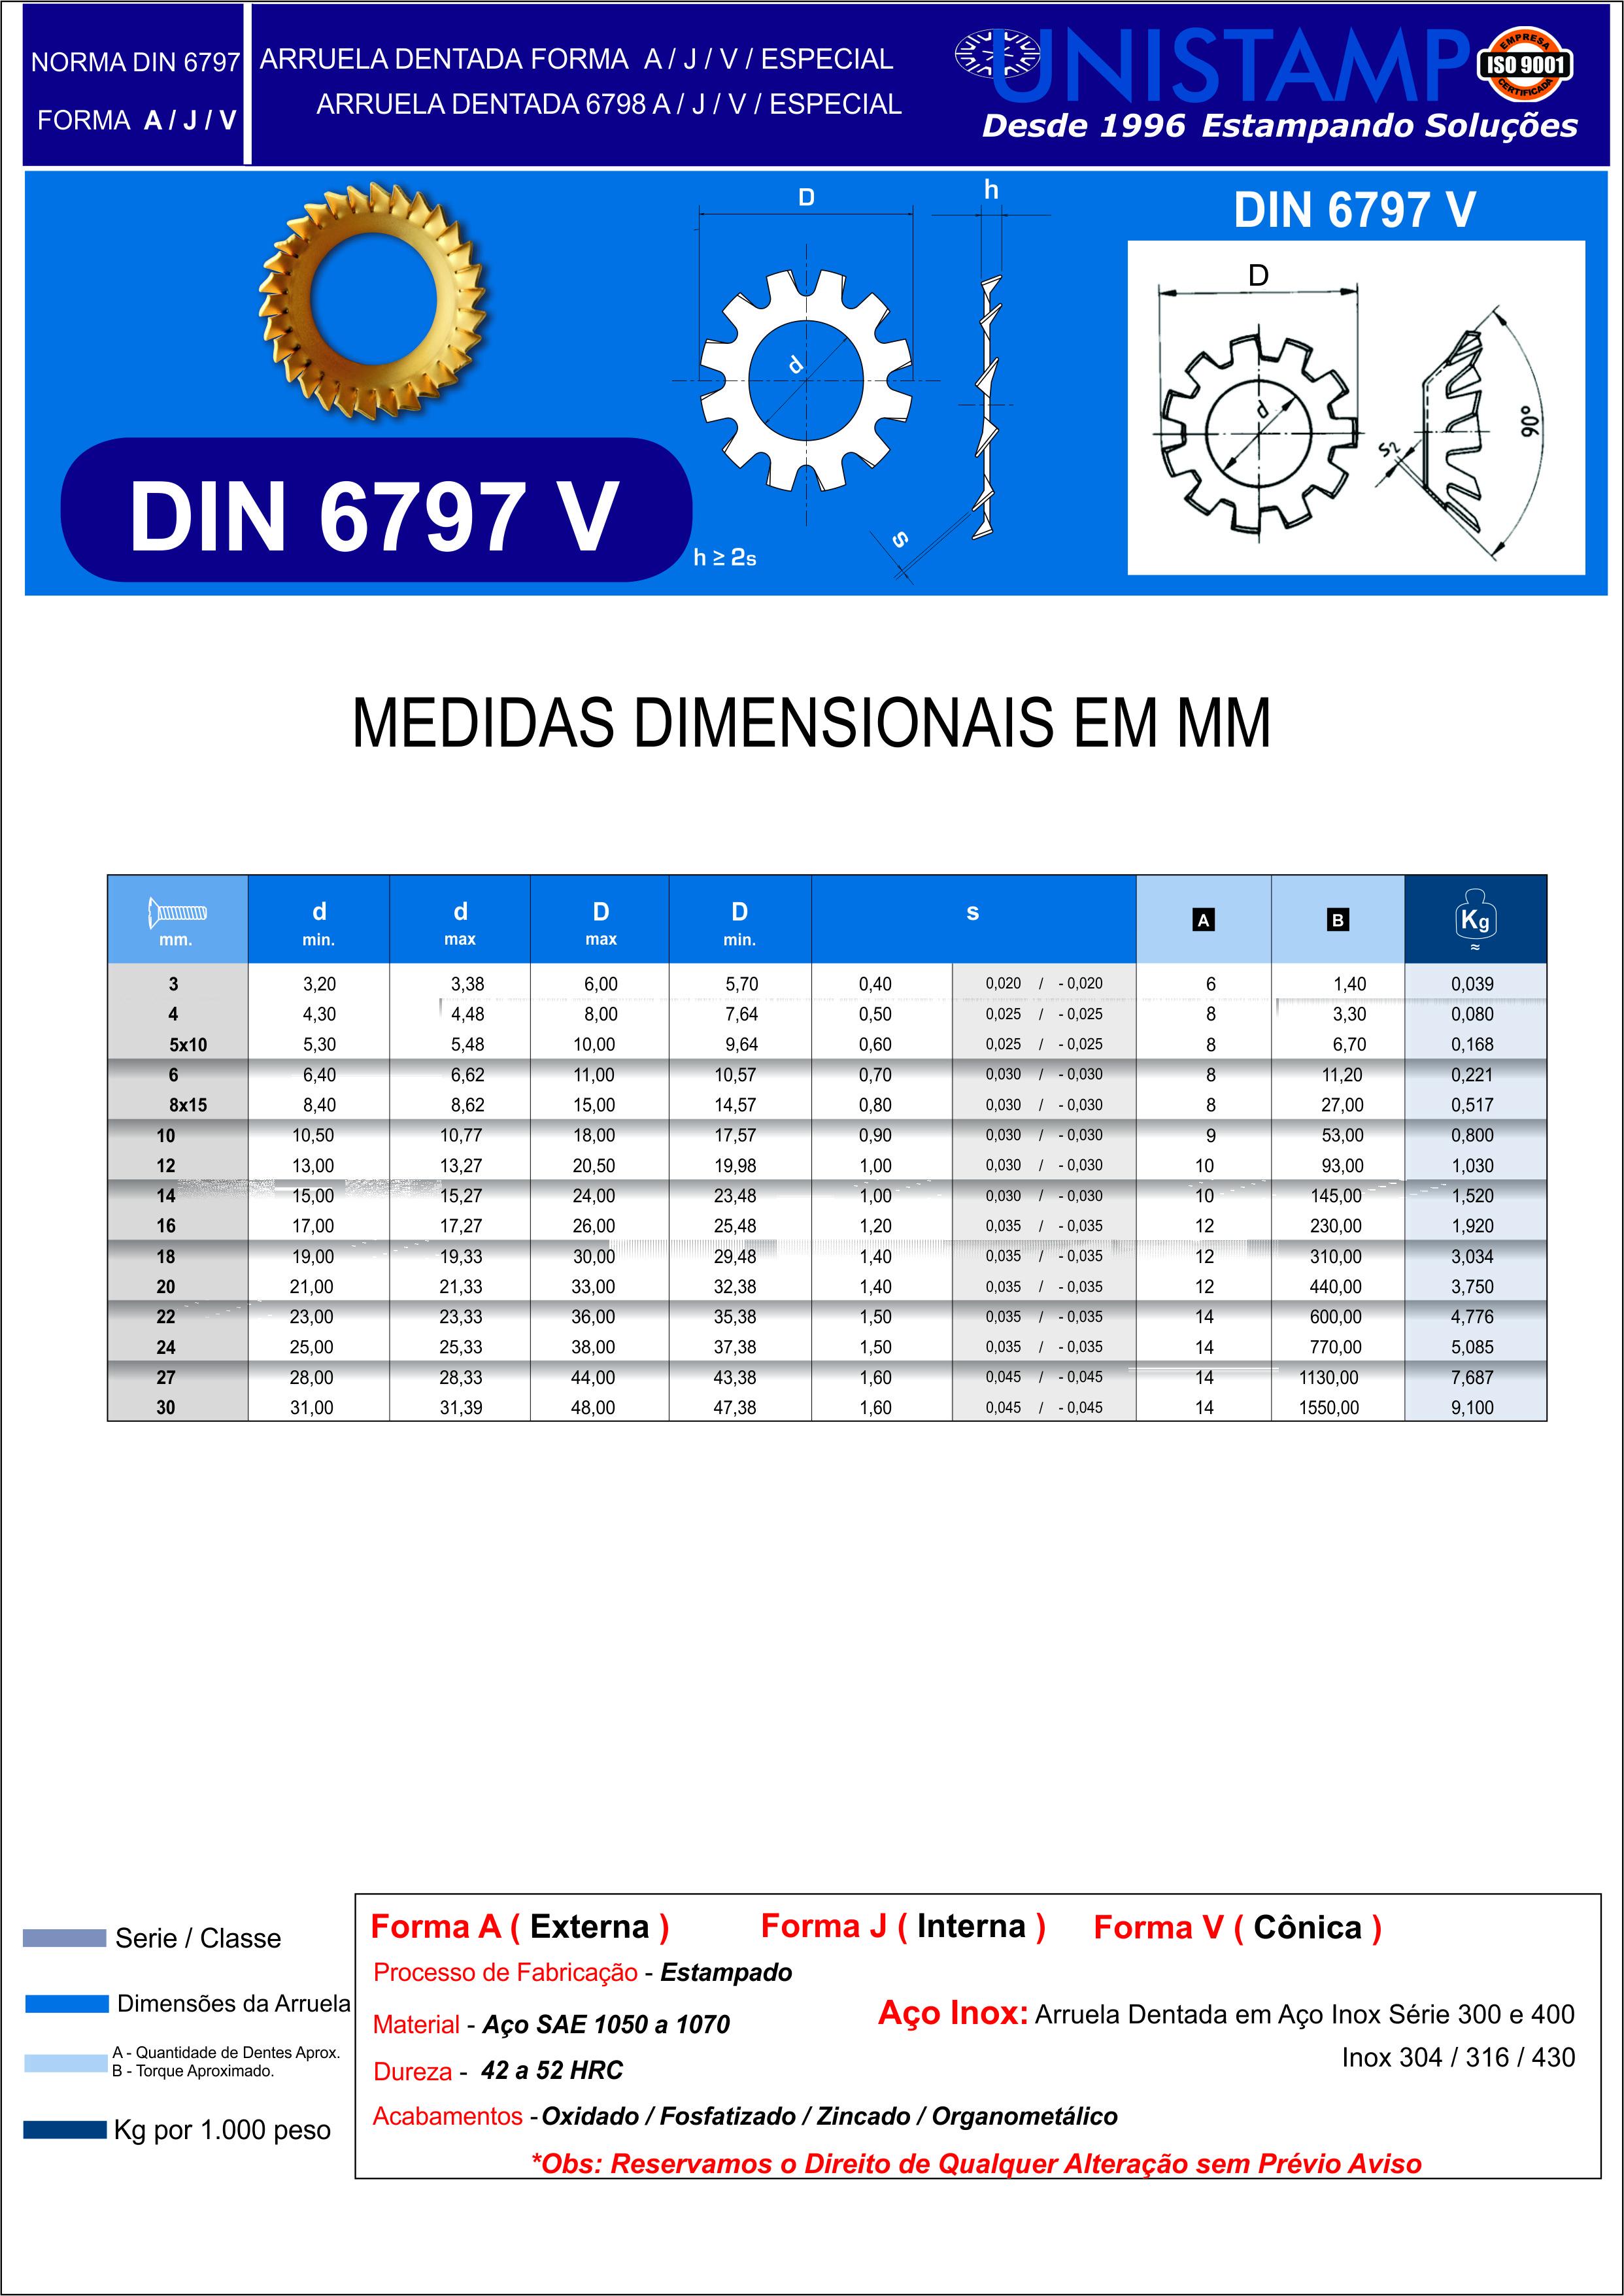 arruela dentada DIN 6797 V